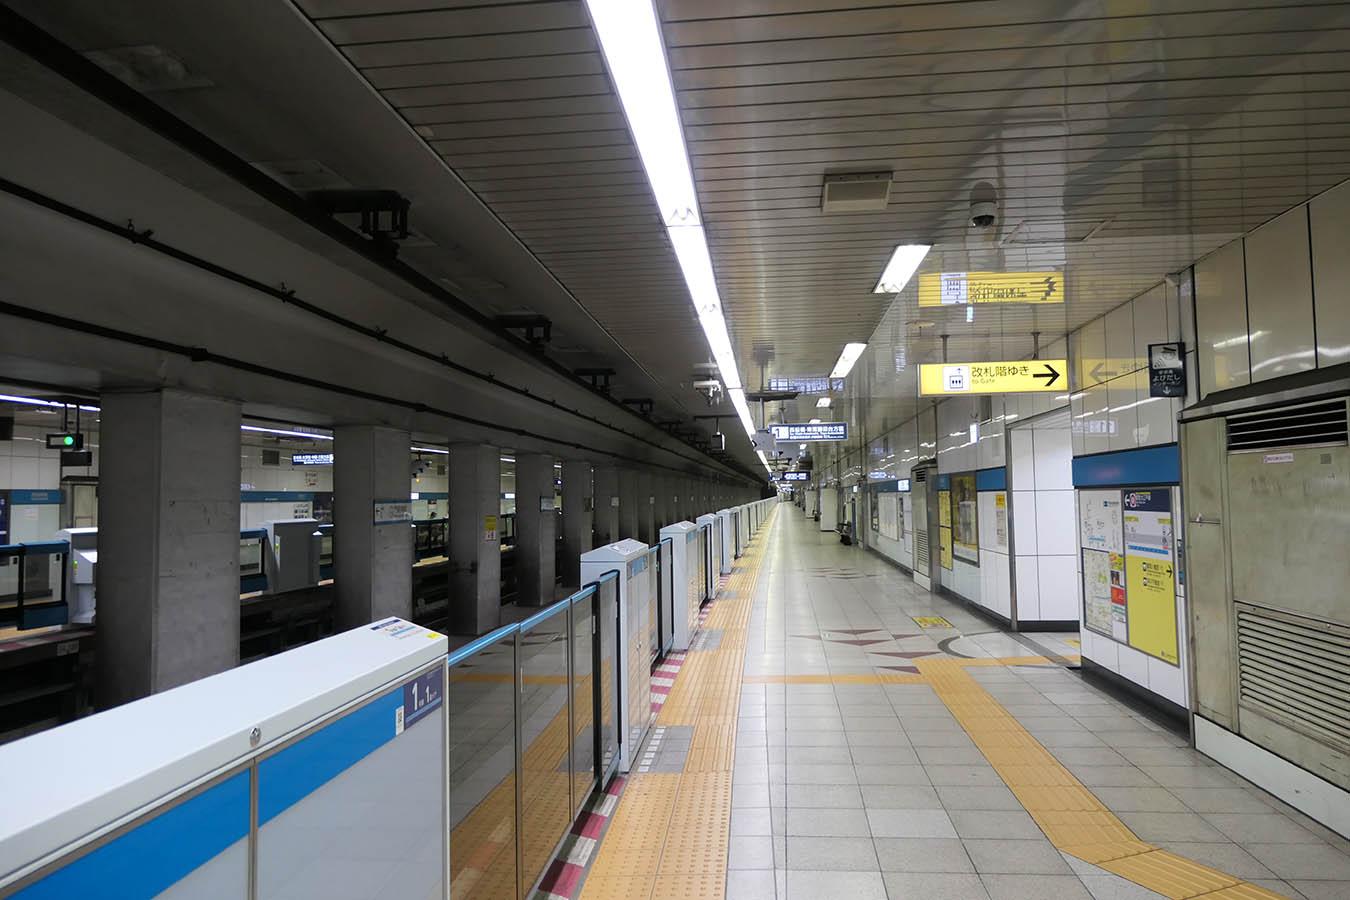 t12_photo04.jpg